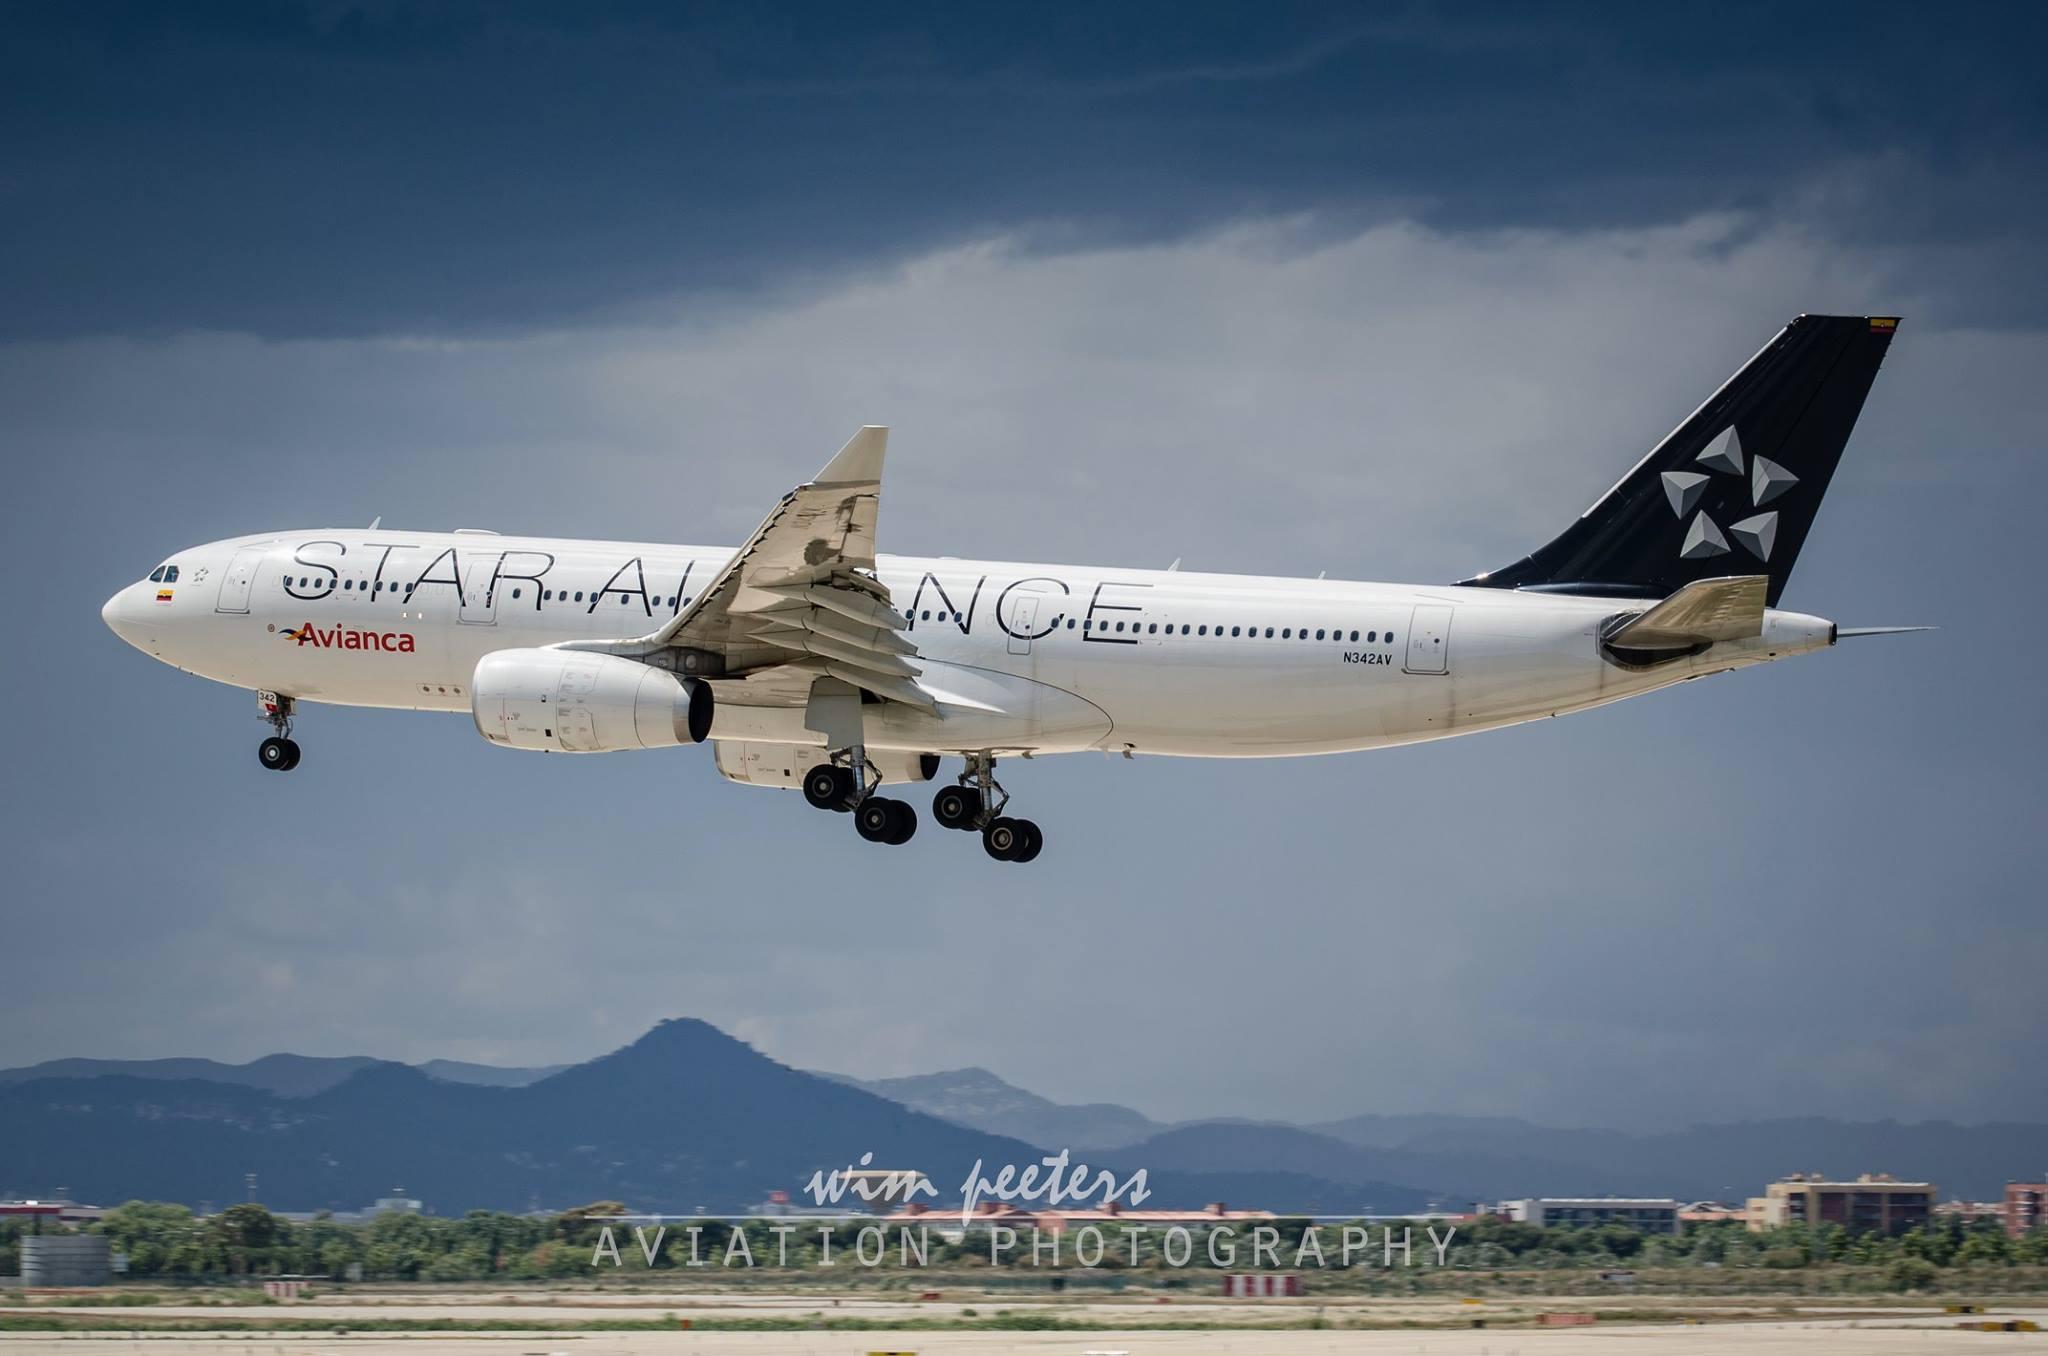 Avianca Airbus A330 - Star Alliance - copyright Wim Peeters